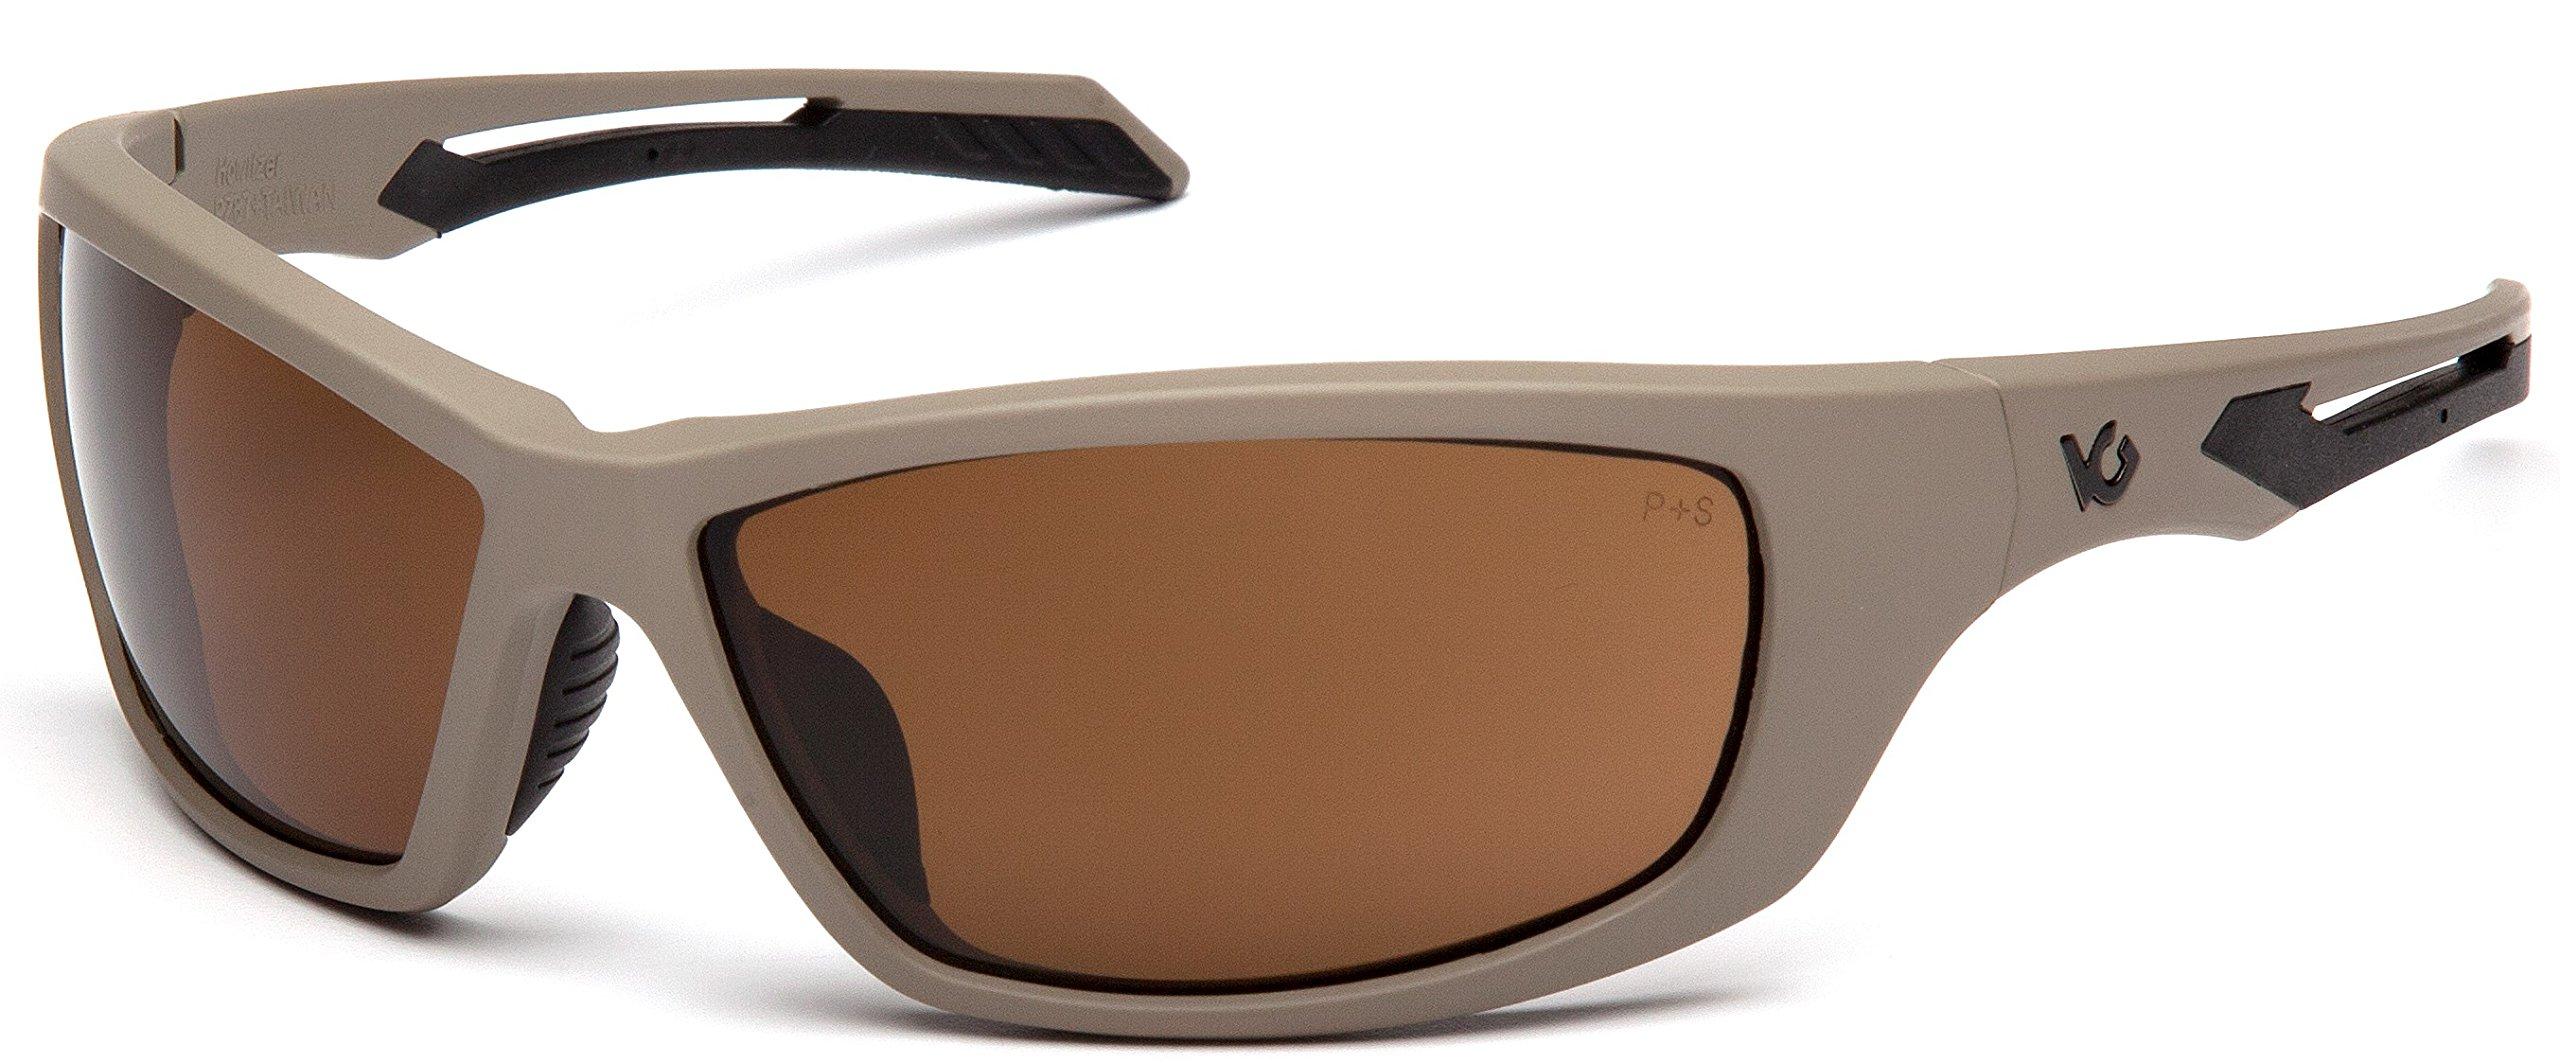 Venture Gear VGST1318T Howitzer Glasses, Bronze Lens by Venture Gear